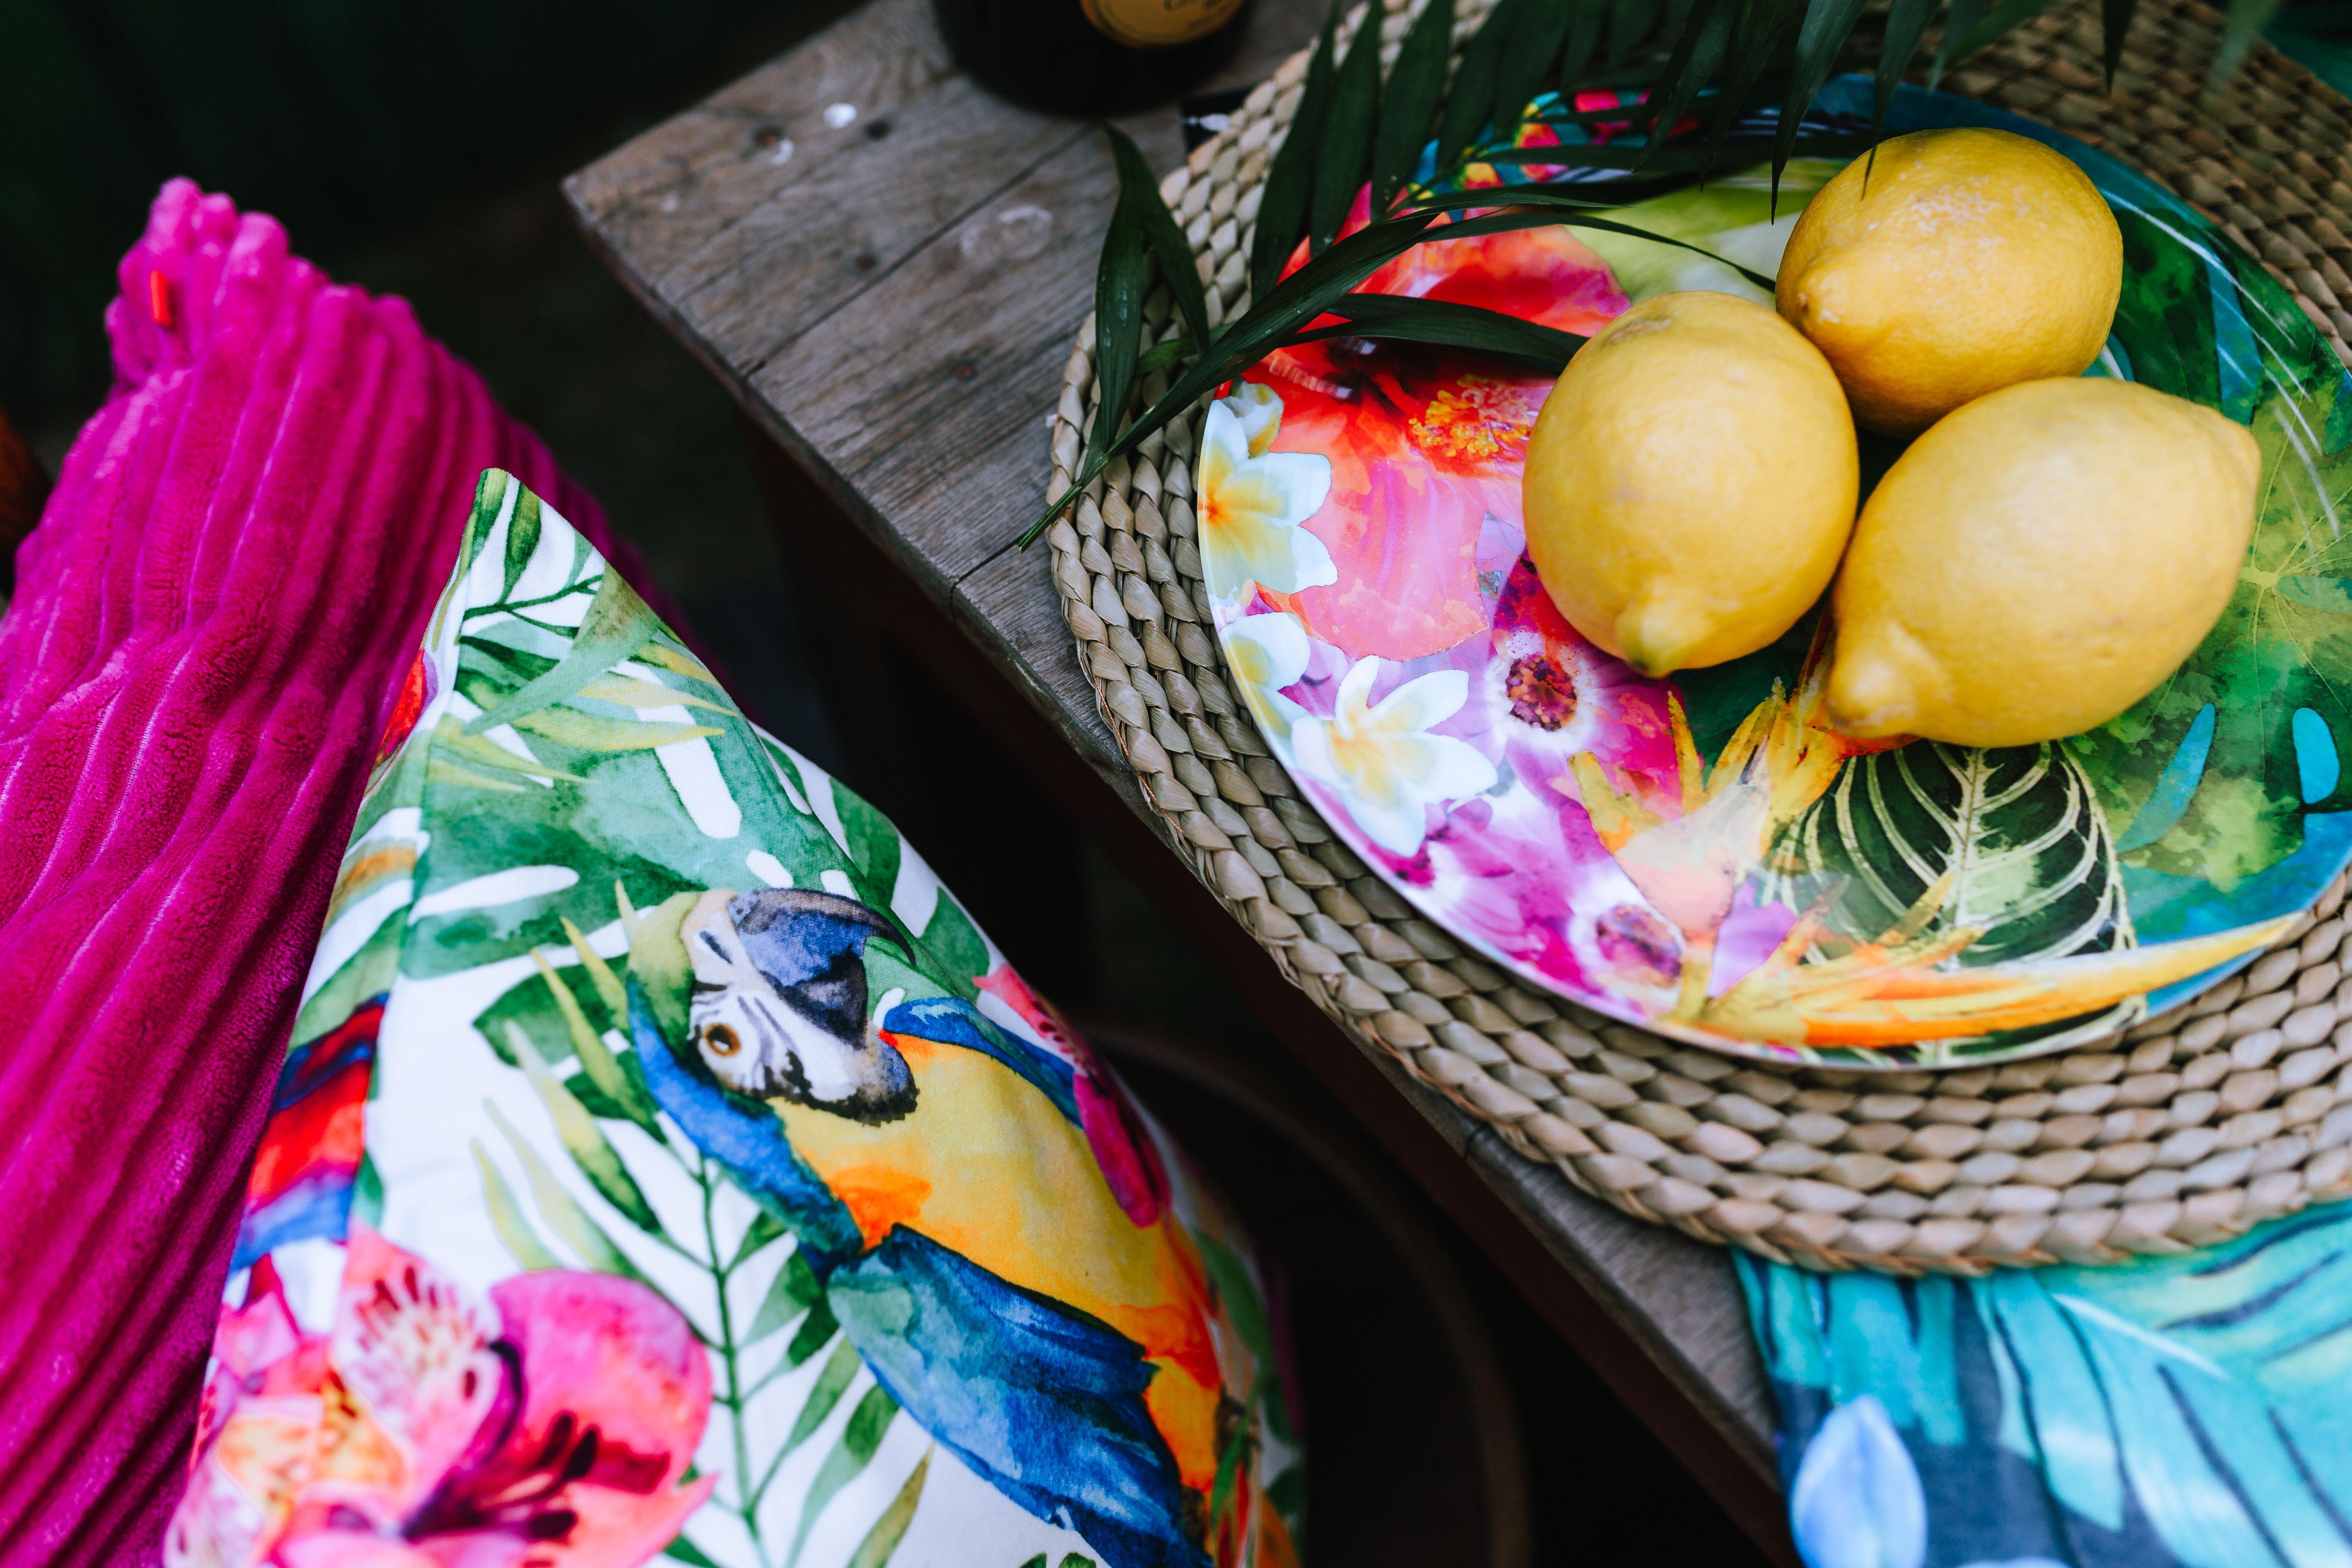 kaboompics_Lemons on colorful plate, tropical pillows